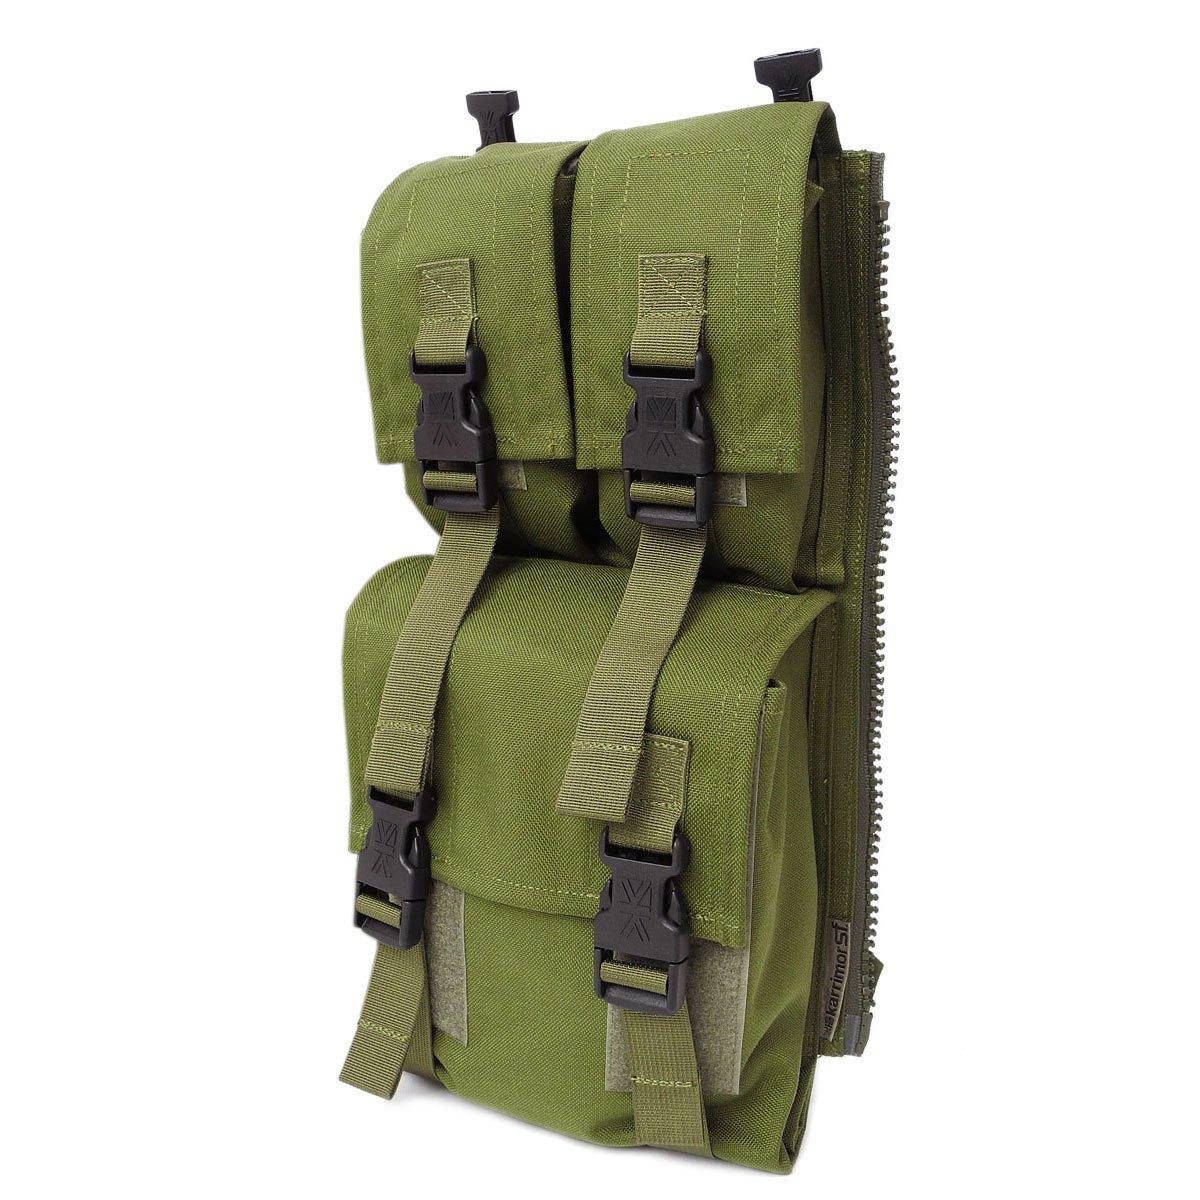 Karrimor SF Predator Side Pocket PLCE Pouch